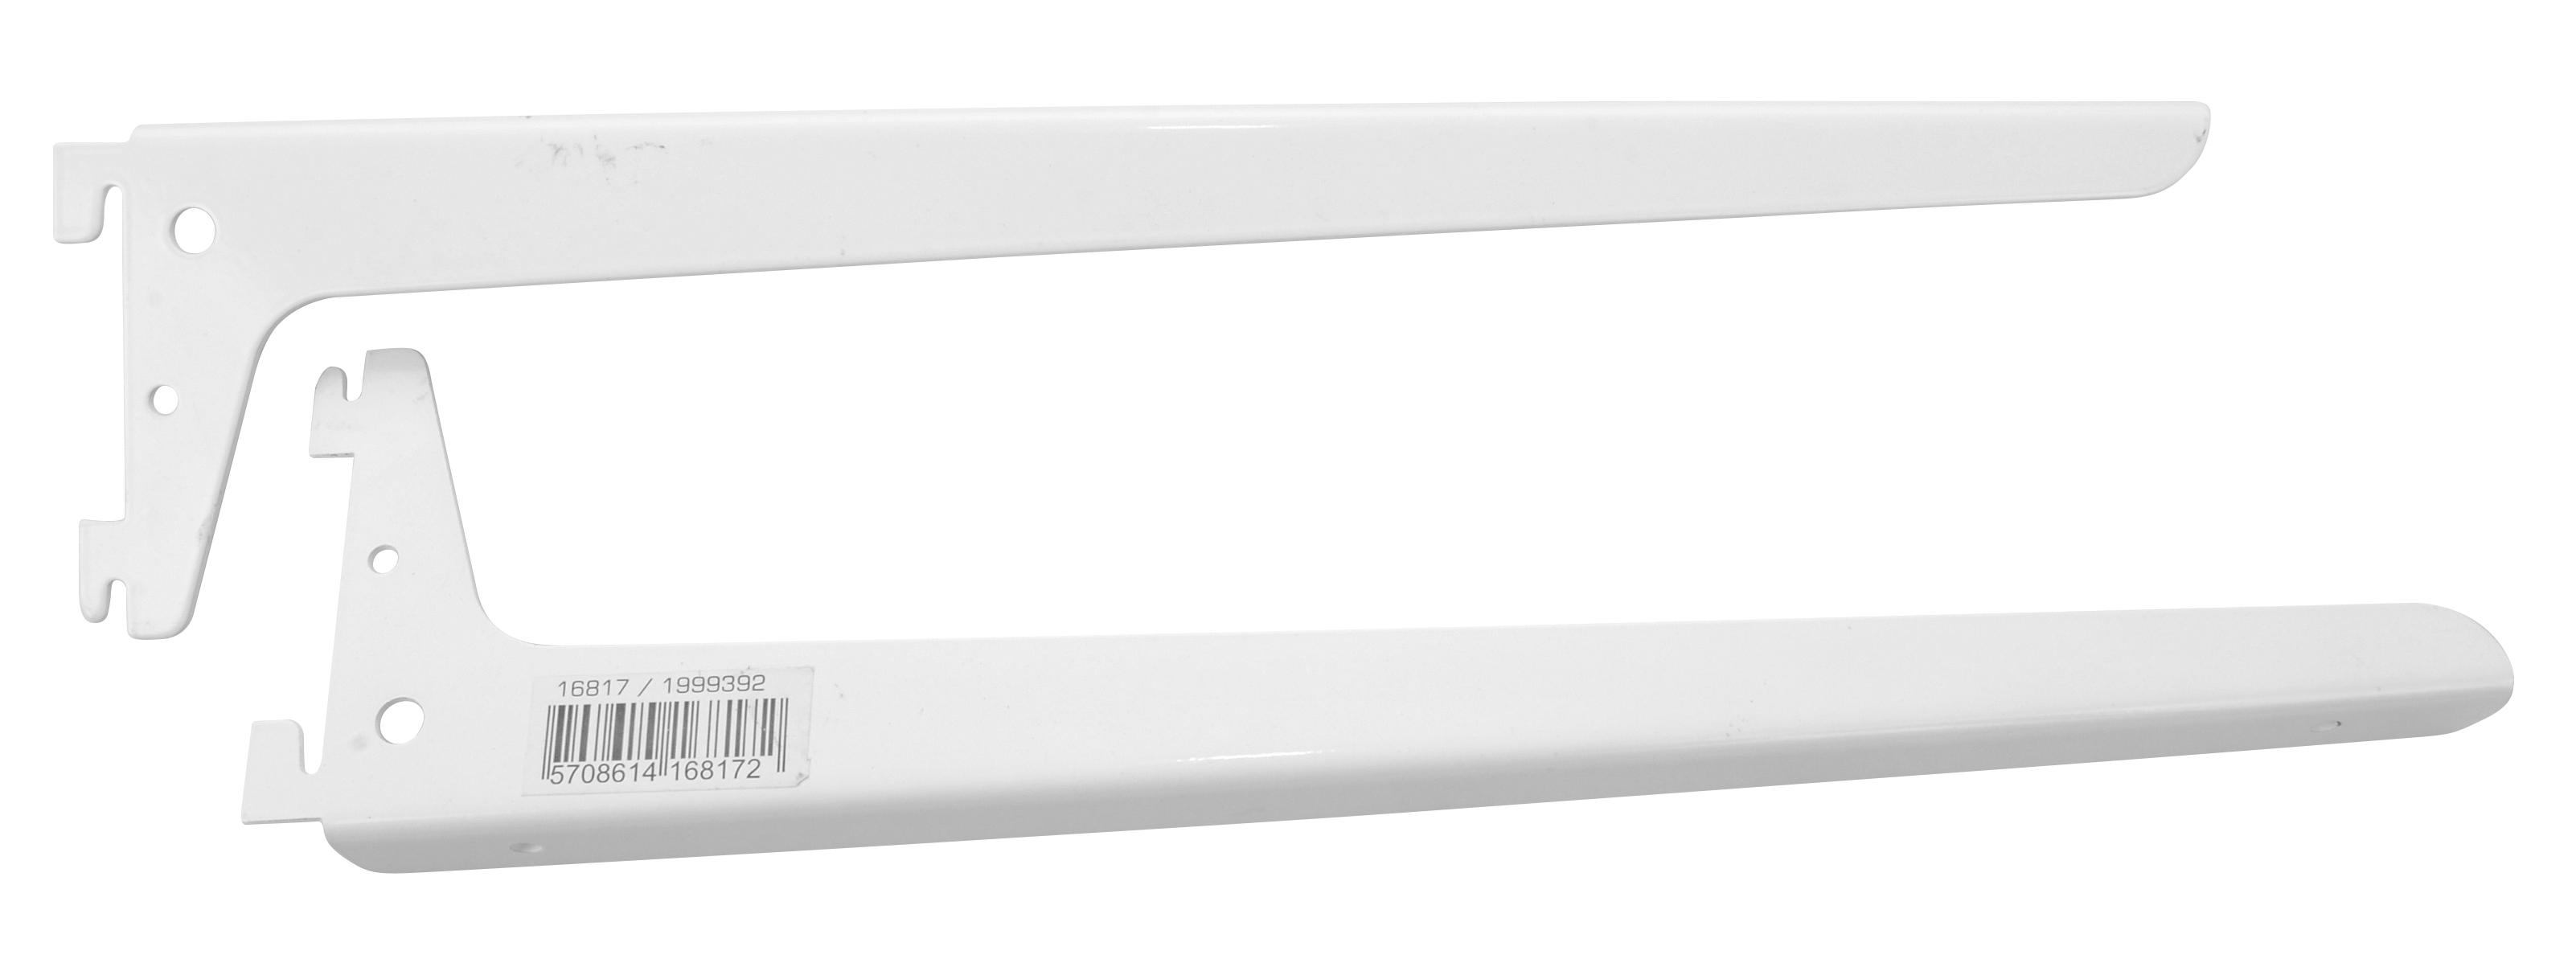 Image of   Hyldeknægt - 370 mm - 2 stk. (par)